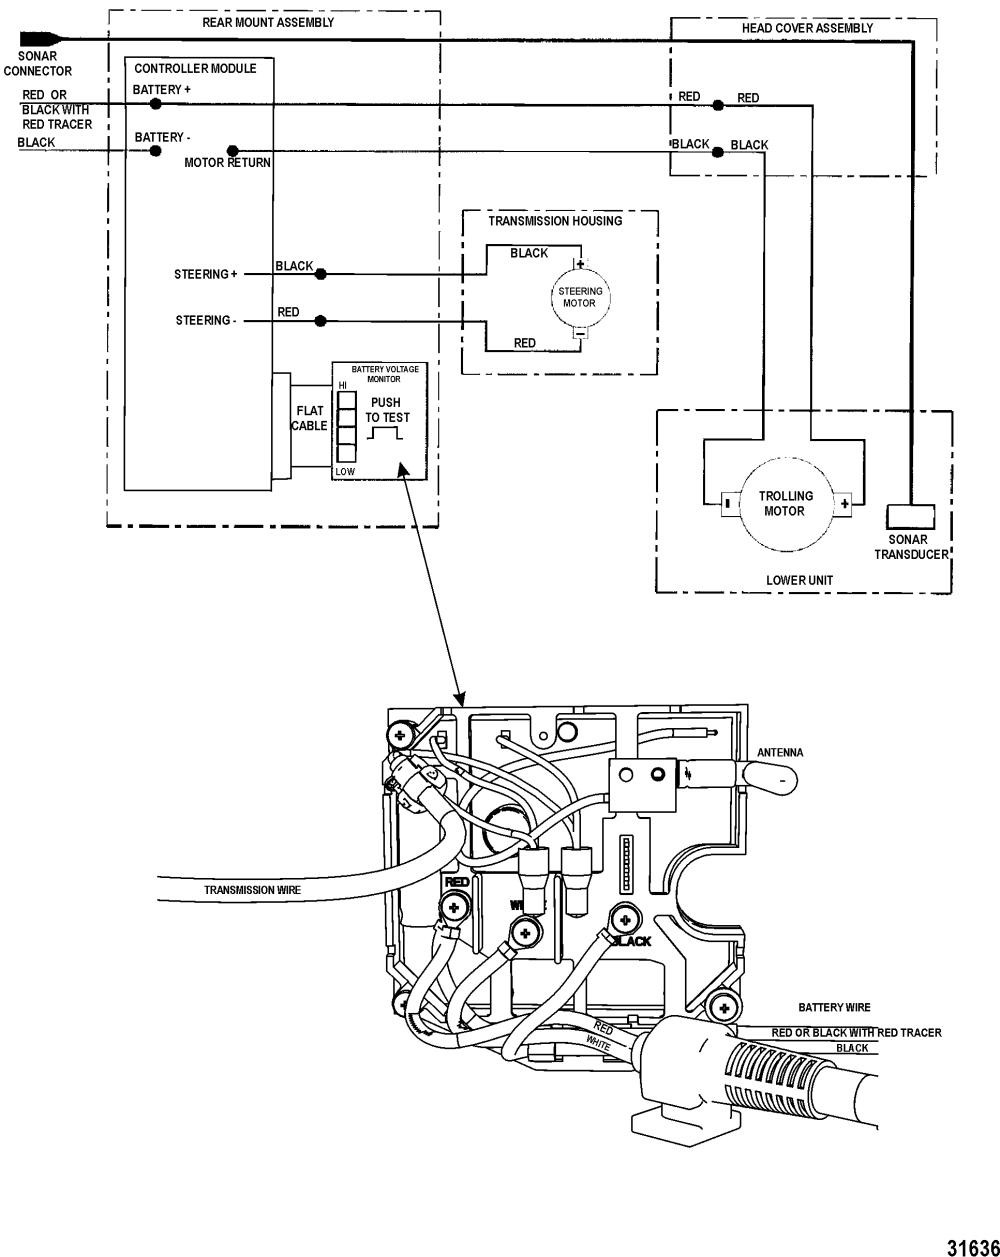 medium resolution of  wiring diagram fresh 2 battery boat trolling motor motorguide brute series 9b000001 rh mercury lakor com